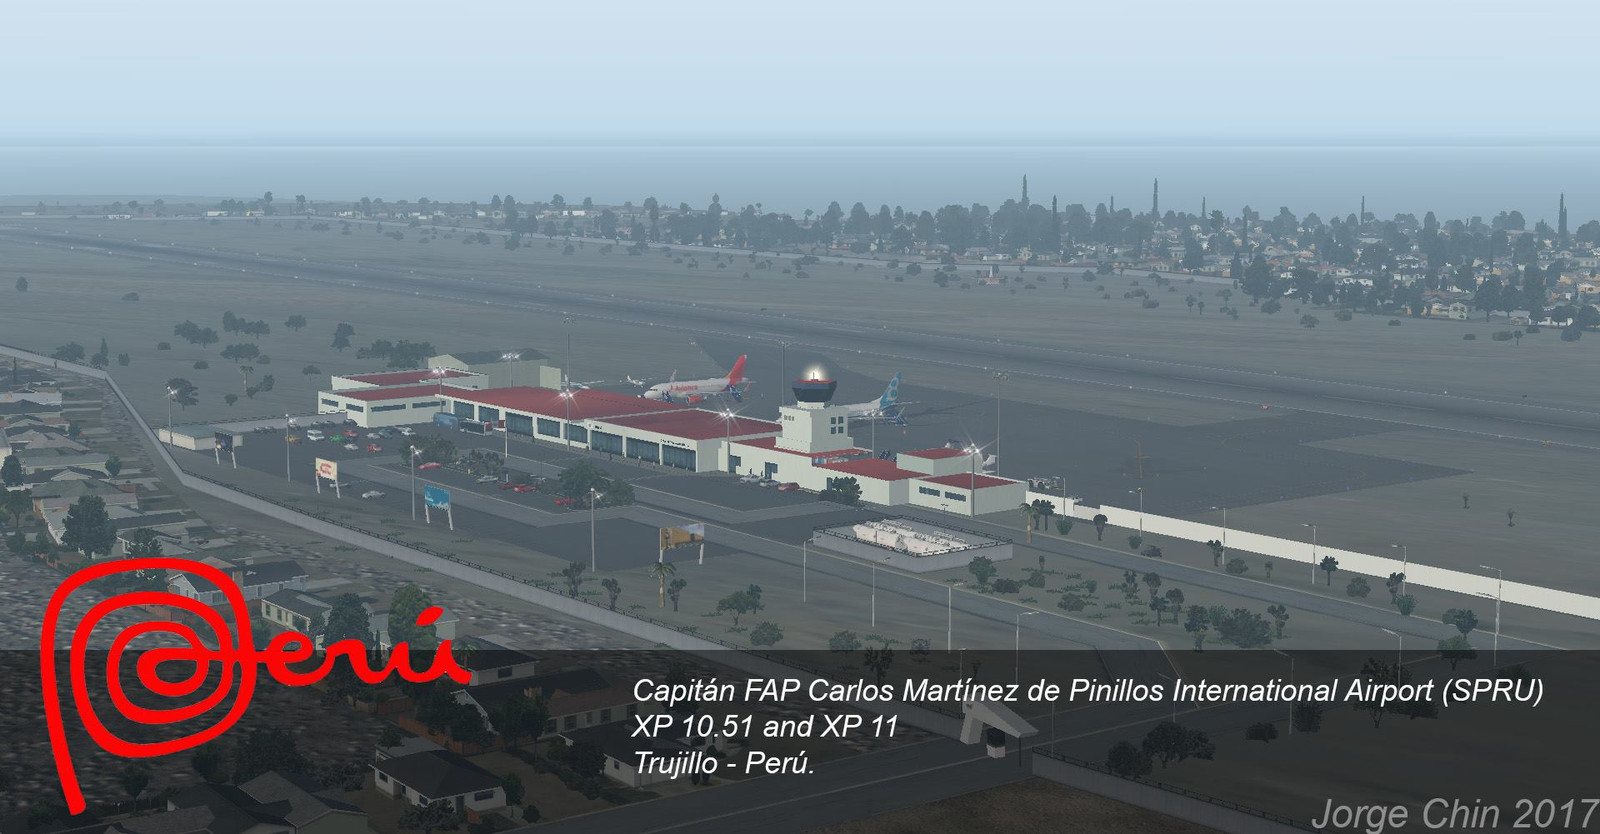 Flightsimscenery   XP11 Trujillo